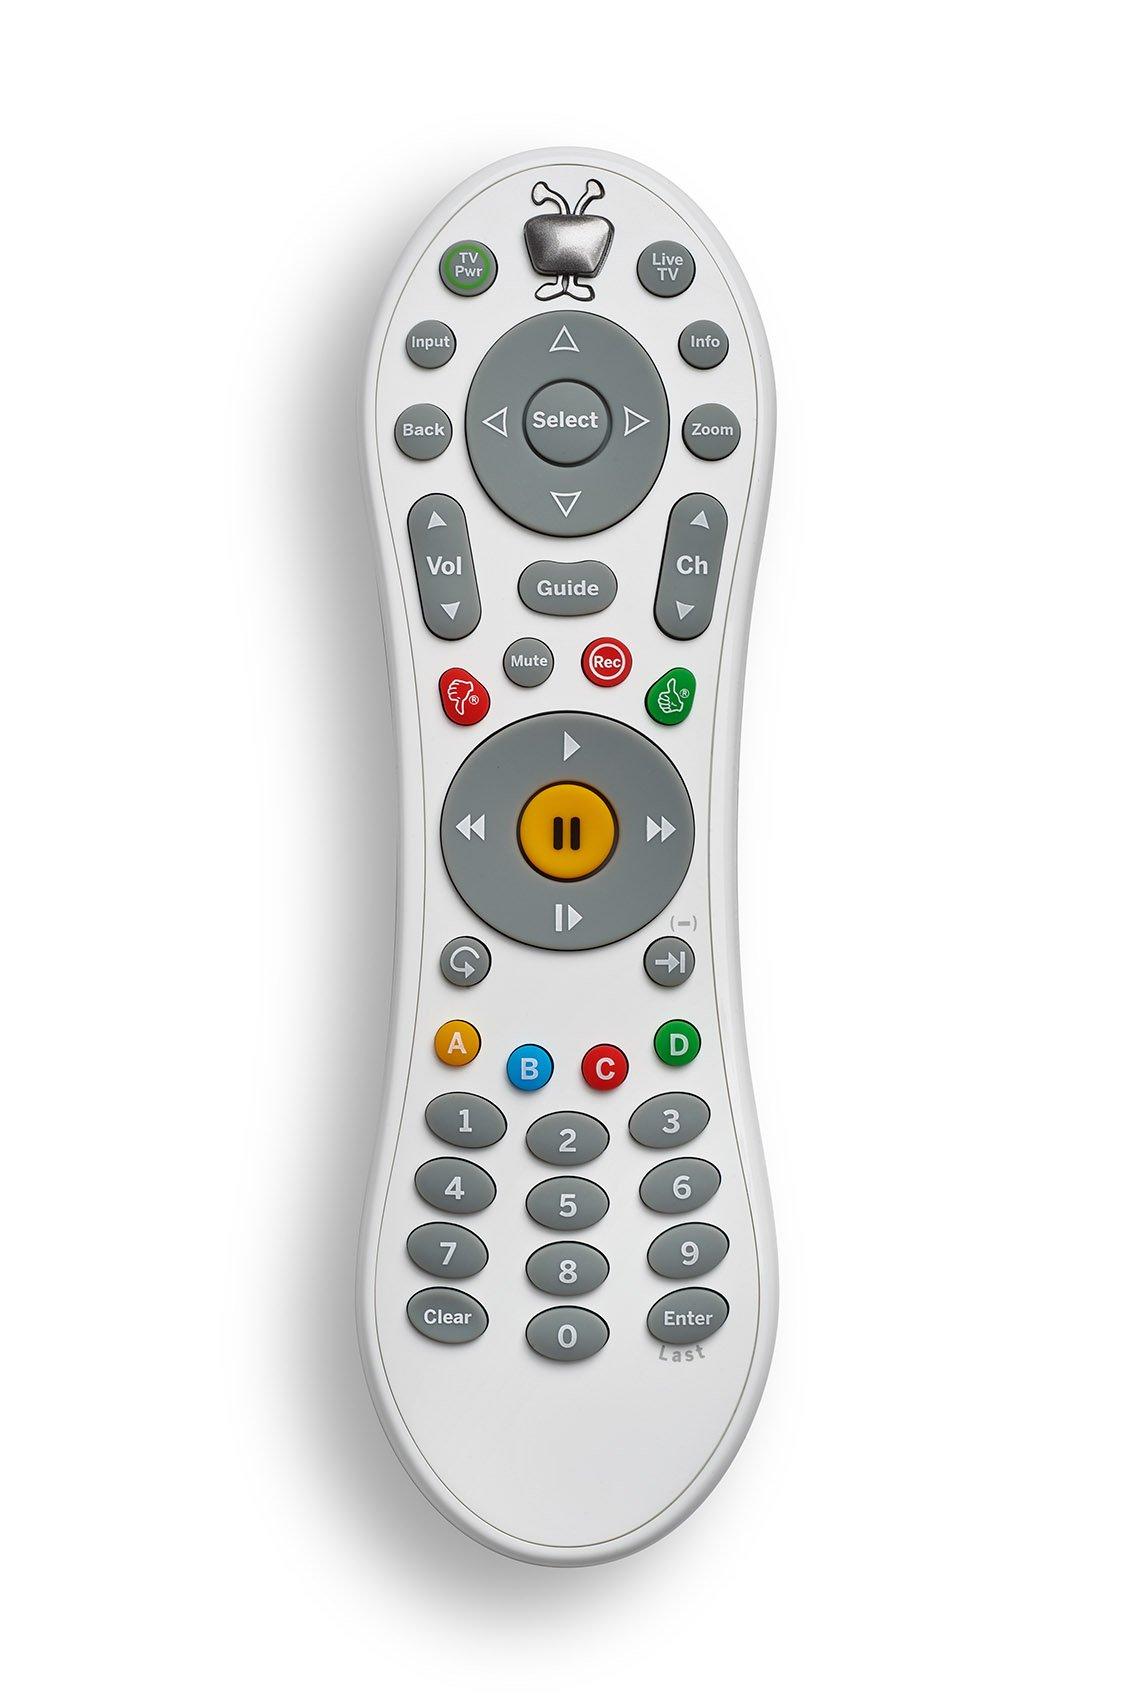 TiVo Bolt Remote Control, White (COO286) by TiVo